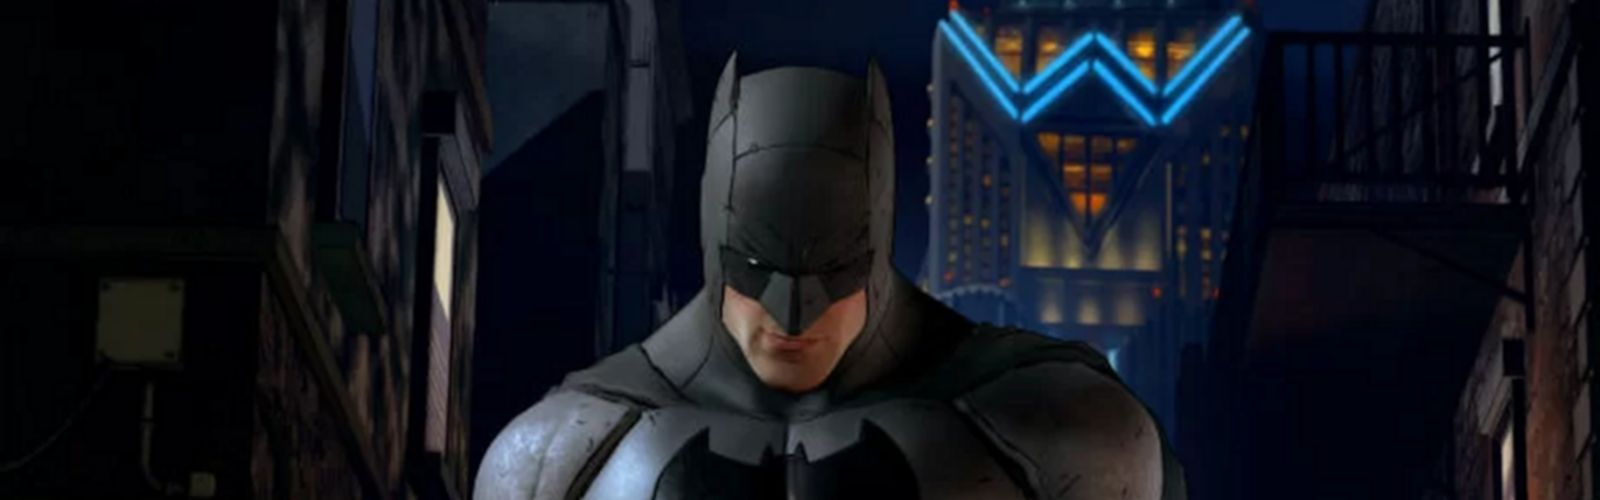 Batman Sins of the Father